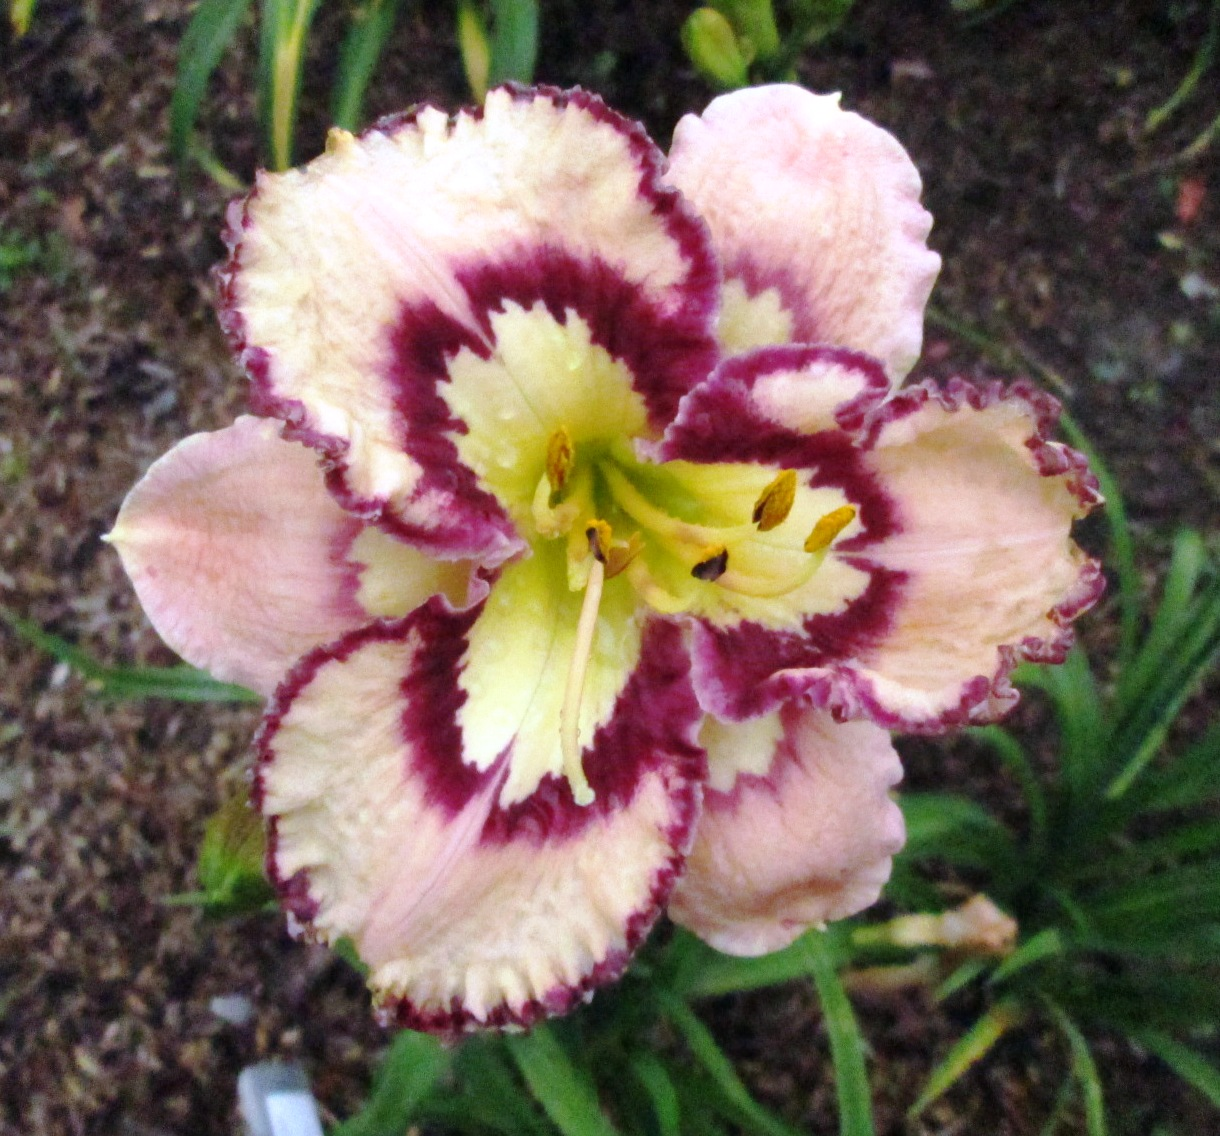 Petal pusher daylilies bella isabella bella isabella 2 izmirmasajfo